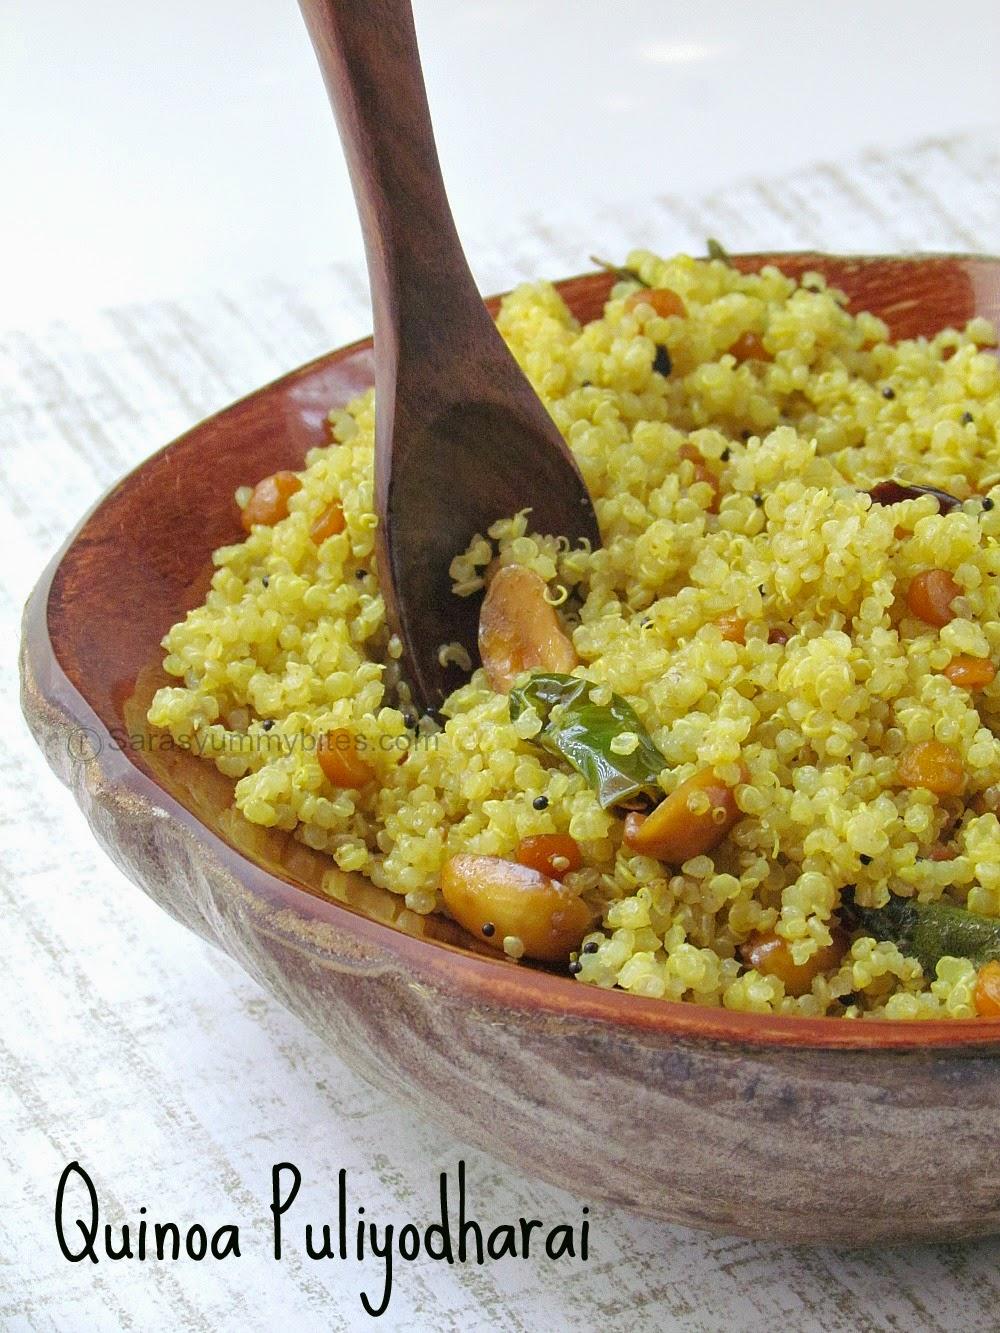 Quinoa Puliyodharai / Quinoa Puliyogare